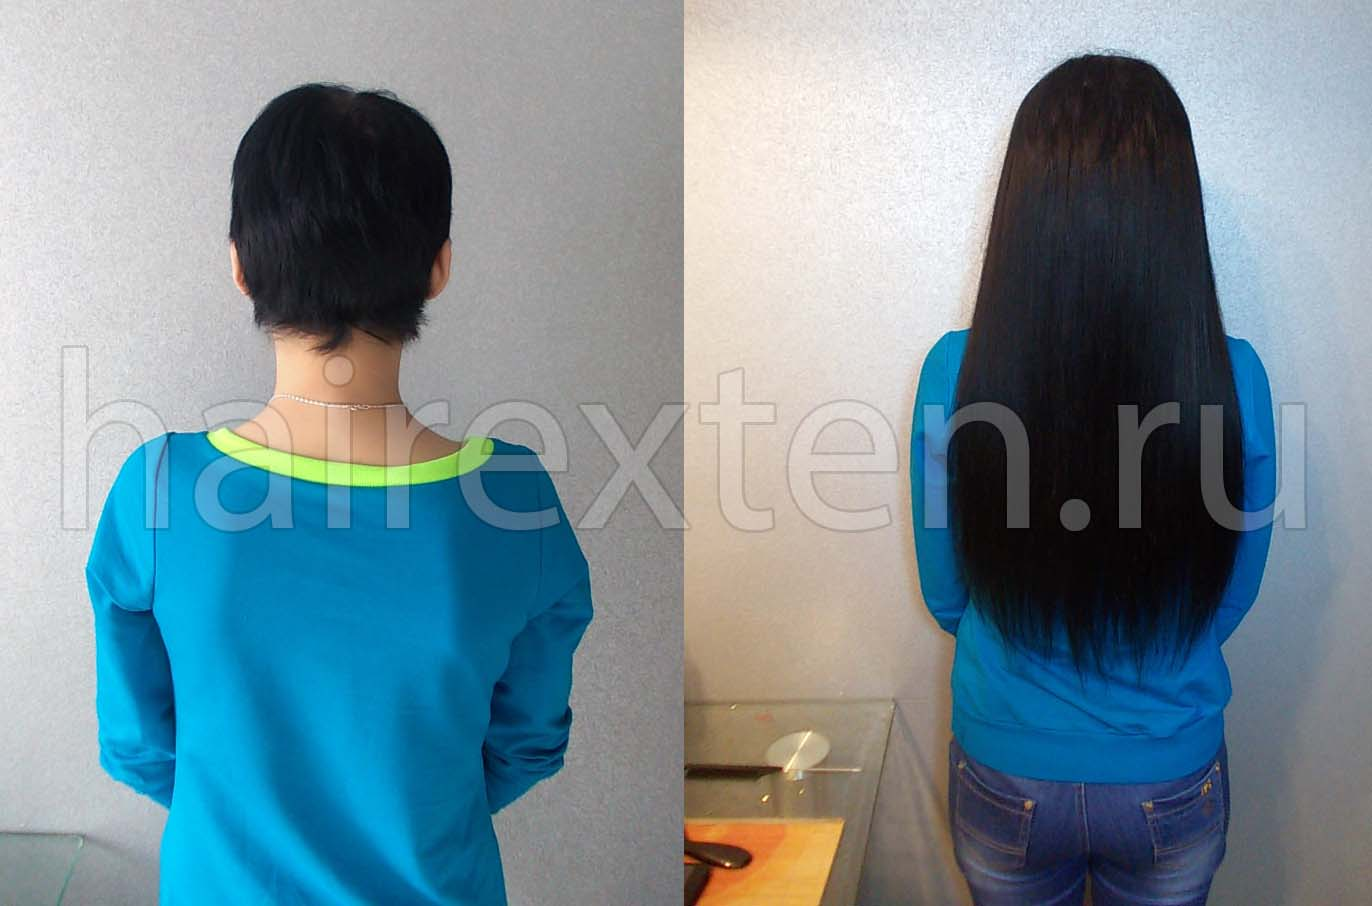 hair-extension-02-02-14.jpg